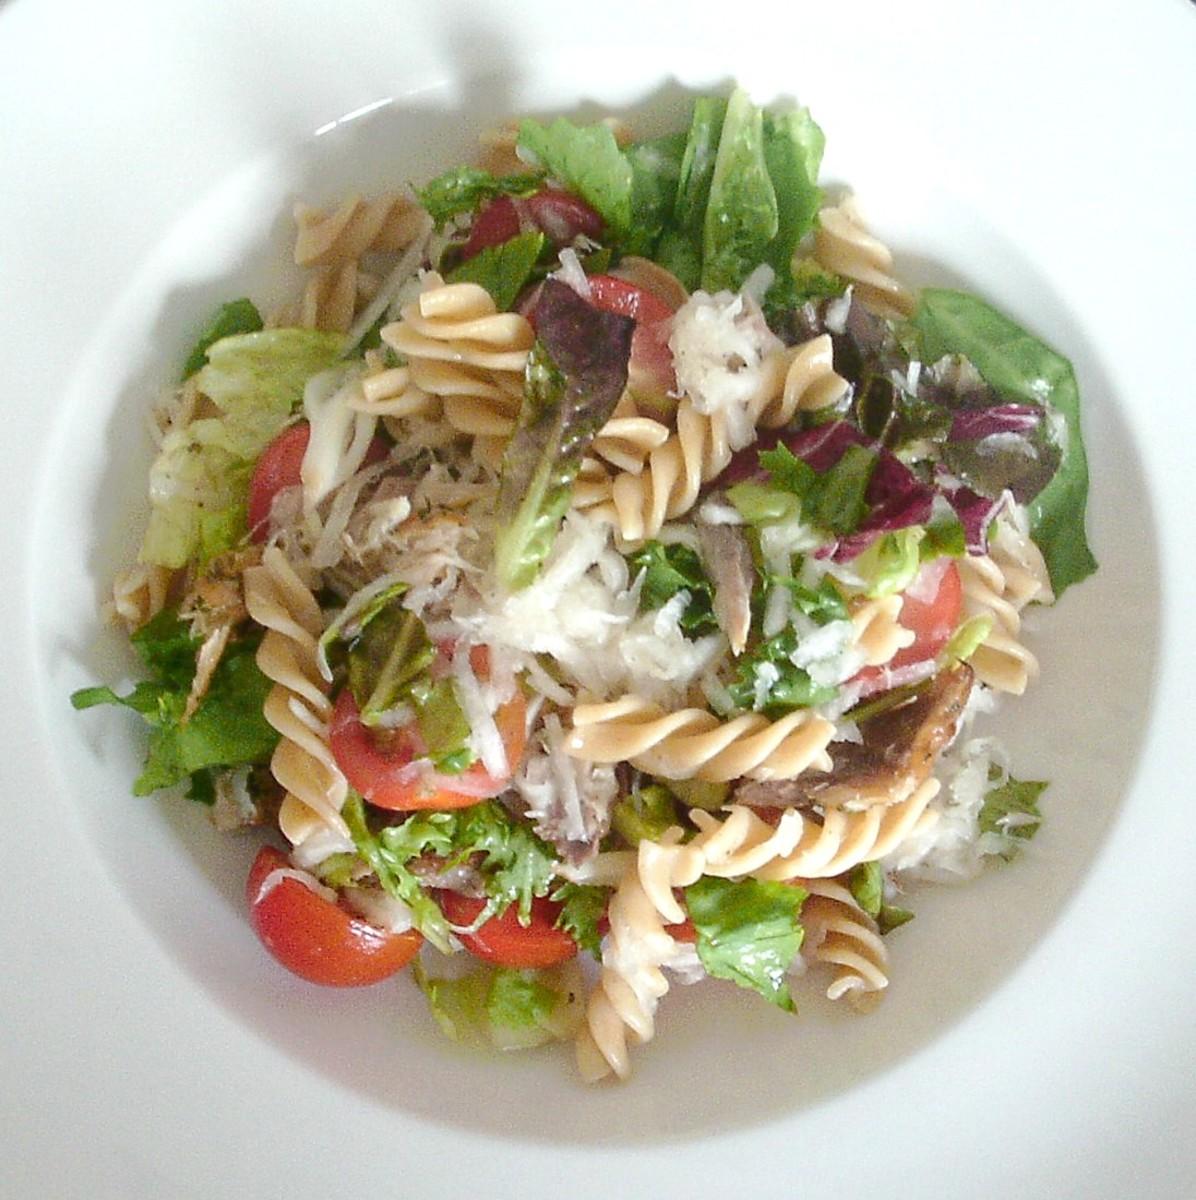 White turnip, smoked mackerel and wholewheat fusilli (rotini) pasta salad